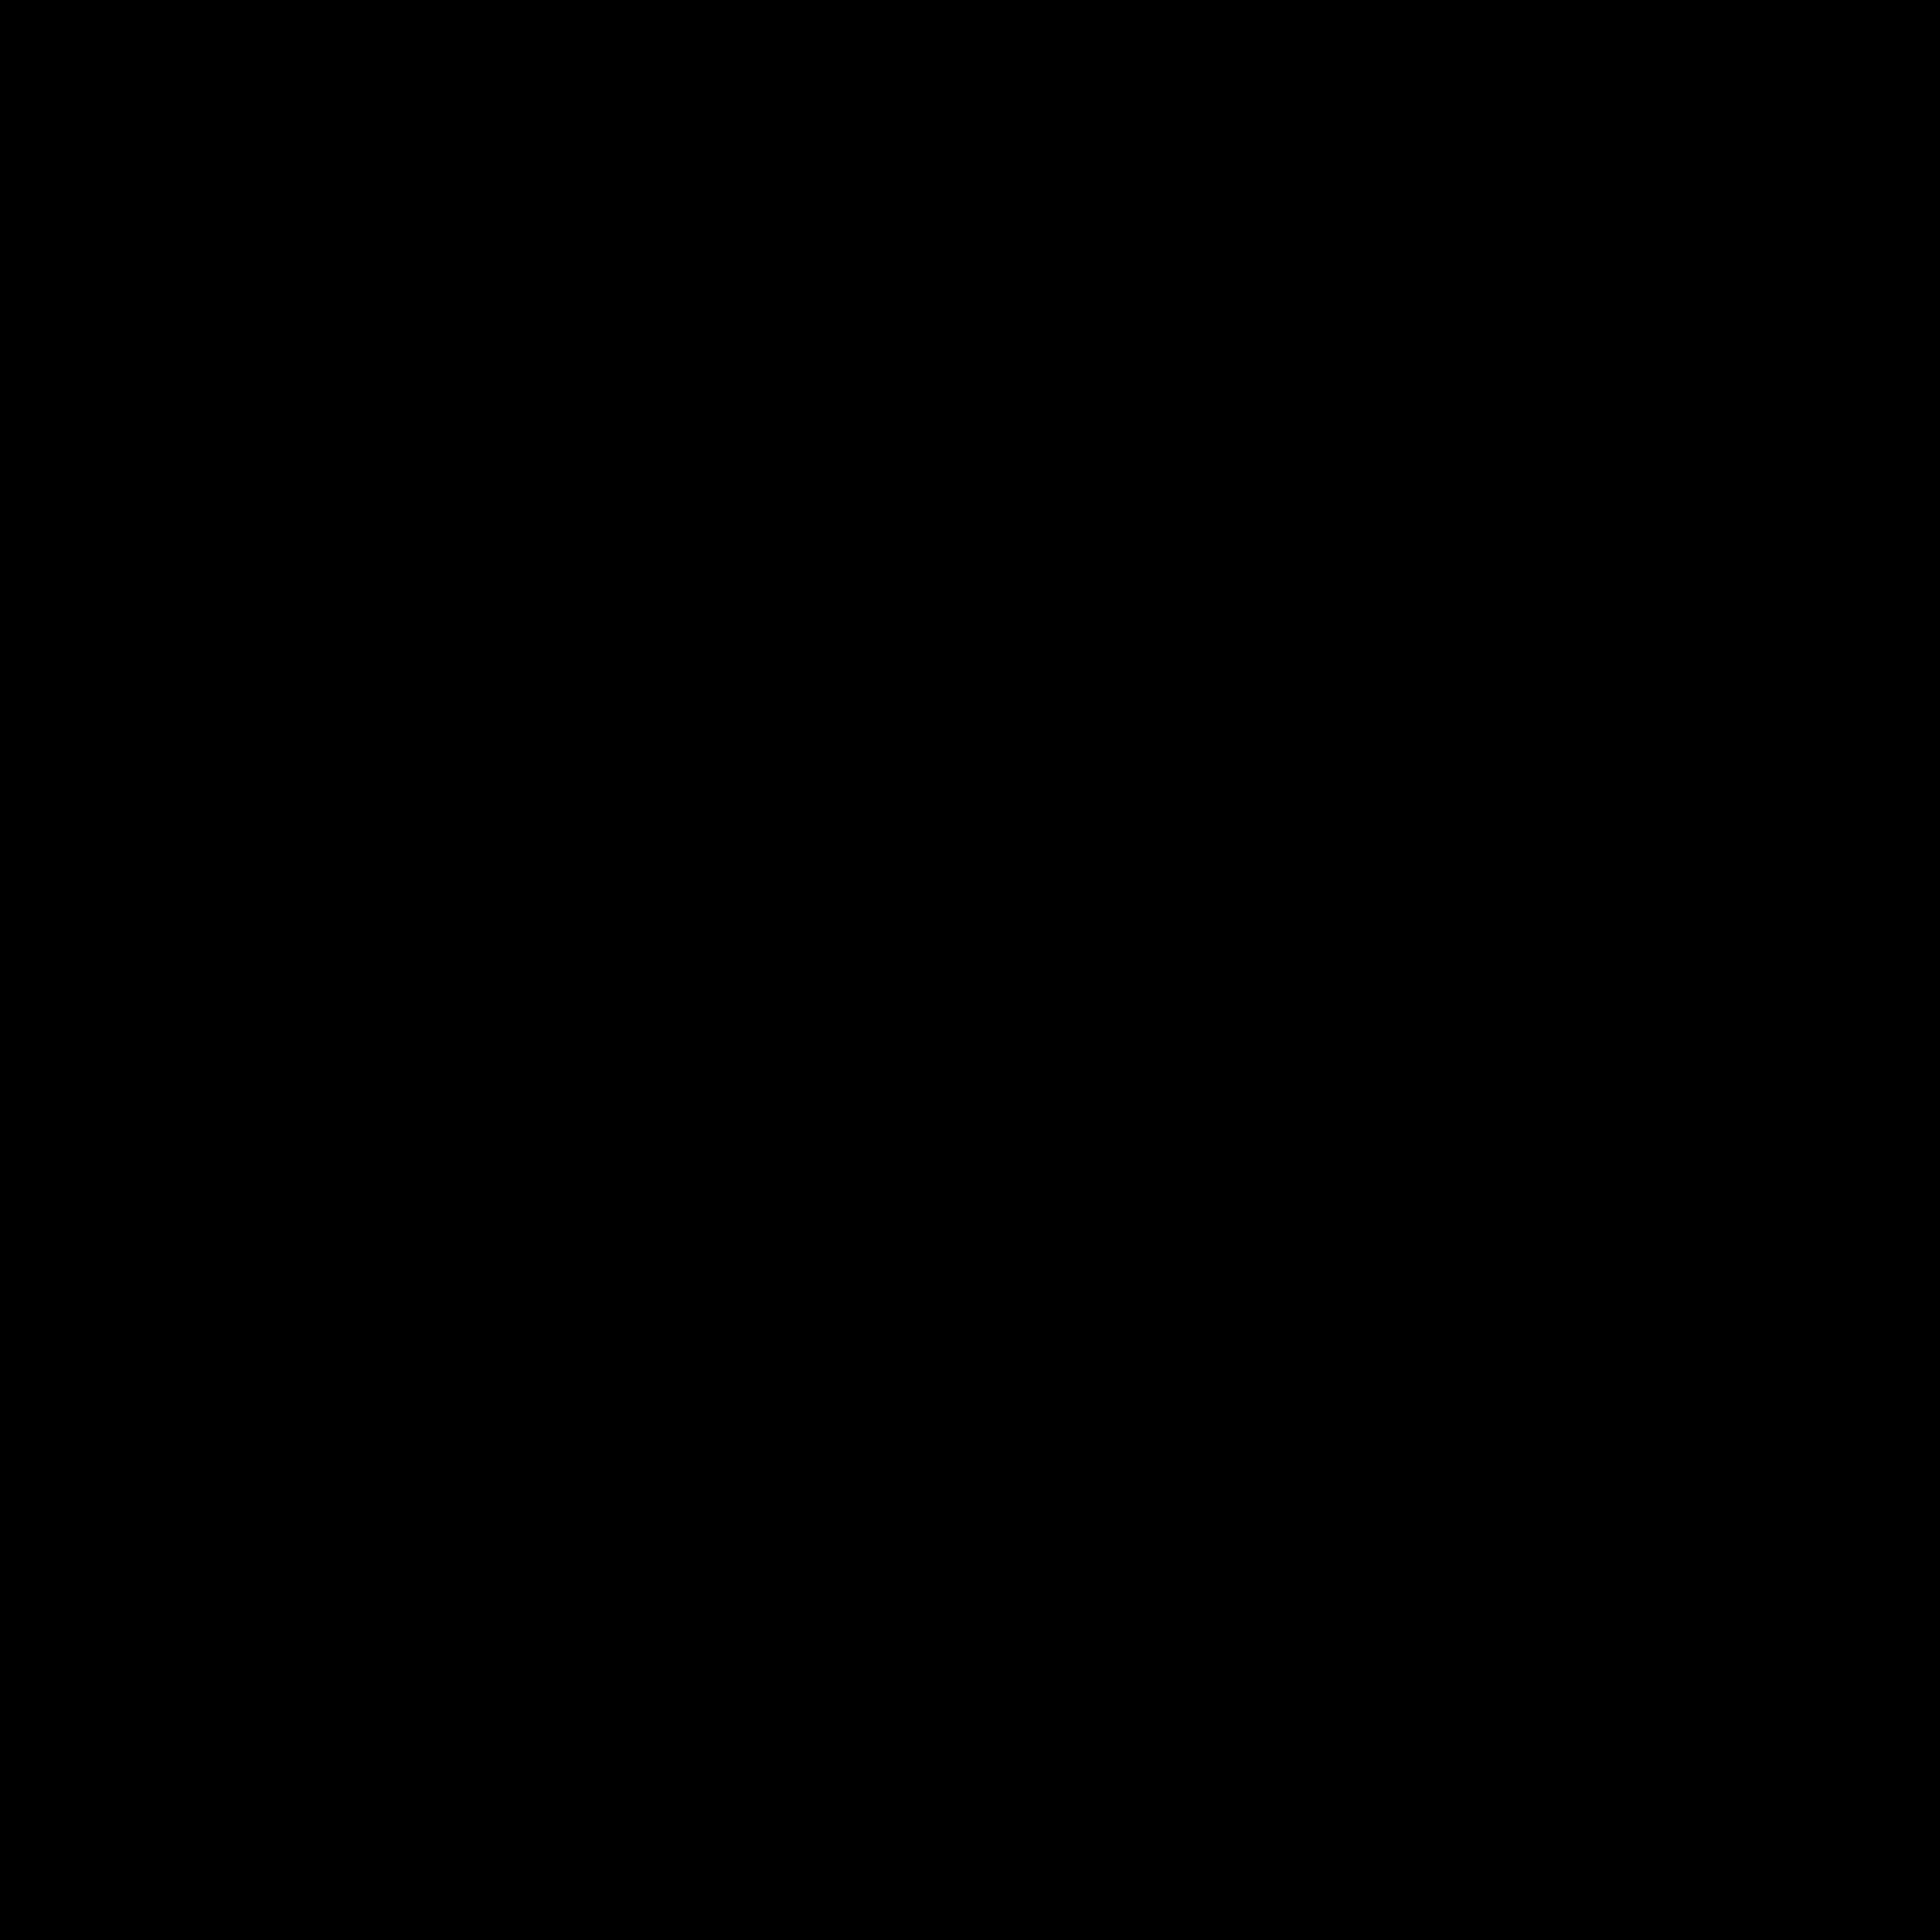 3600x3600 Black Solid Color Background